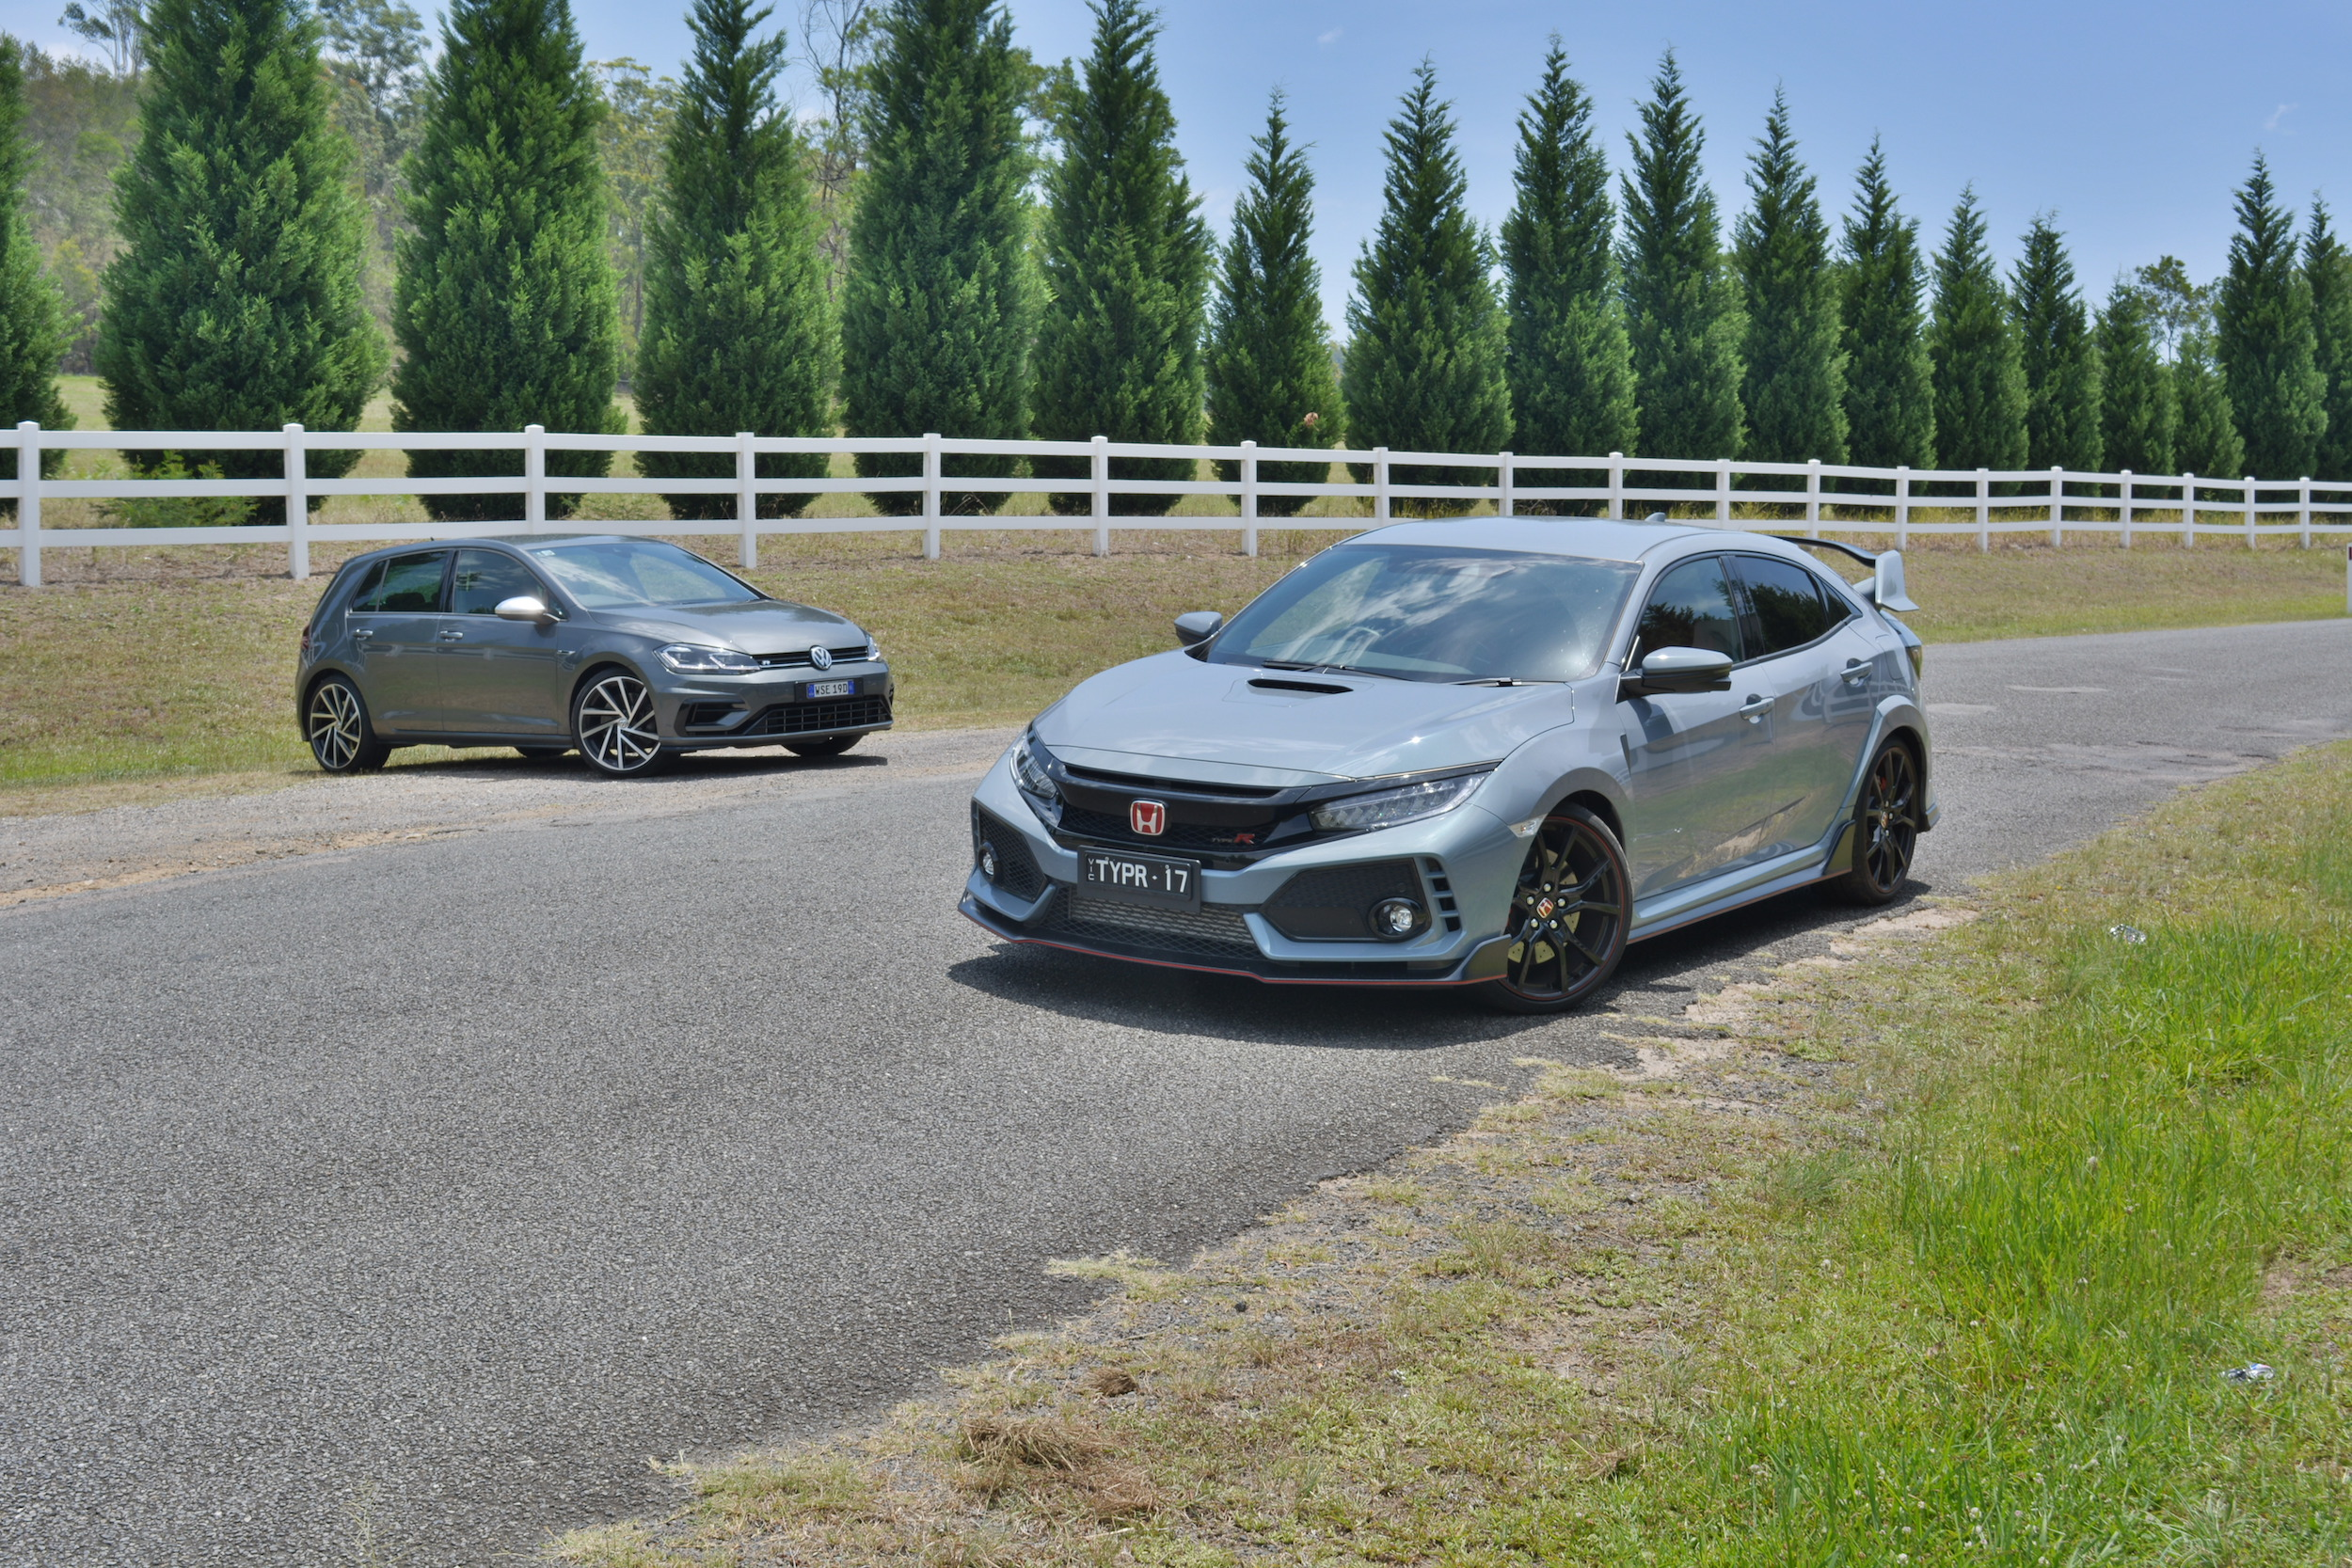 Hot hatch match - Honda Civic Type-R v Volkswagen Golf R Comparison Test